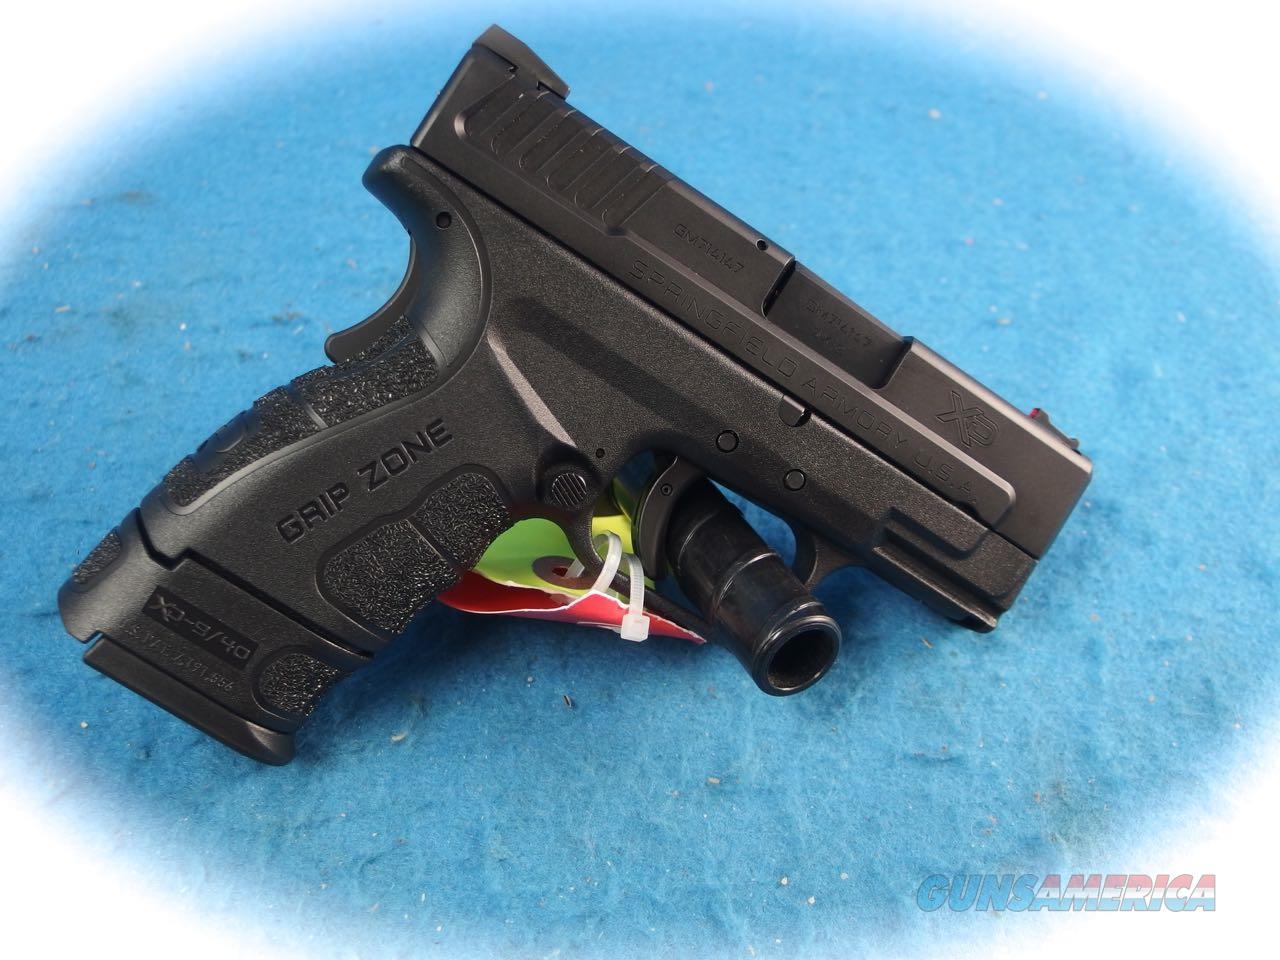 SpringfieldArmory XD MOD.2 – 3 Inch SUB-COMPACT MODEL 9MM **New**  Guns > Pistols > Springfield Armory Pistols > XD-Mod.2